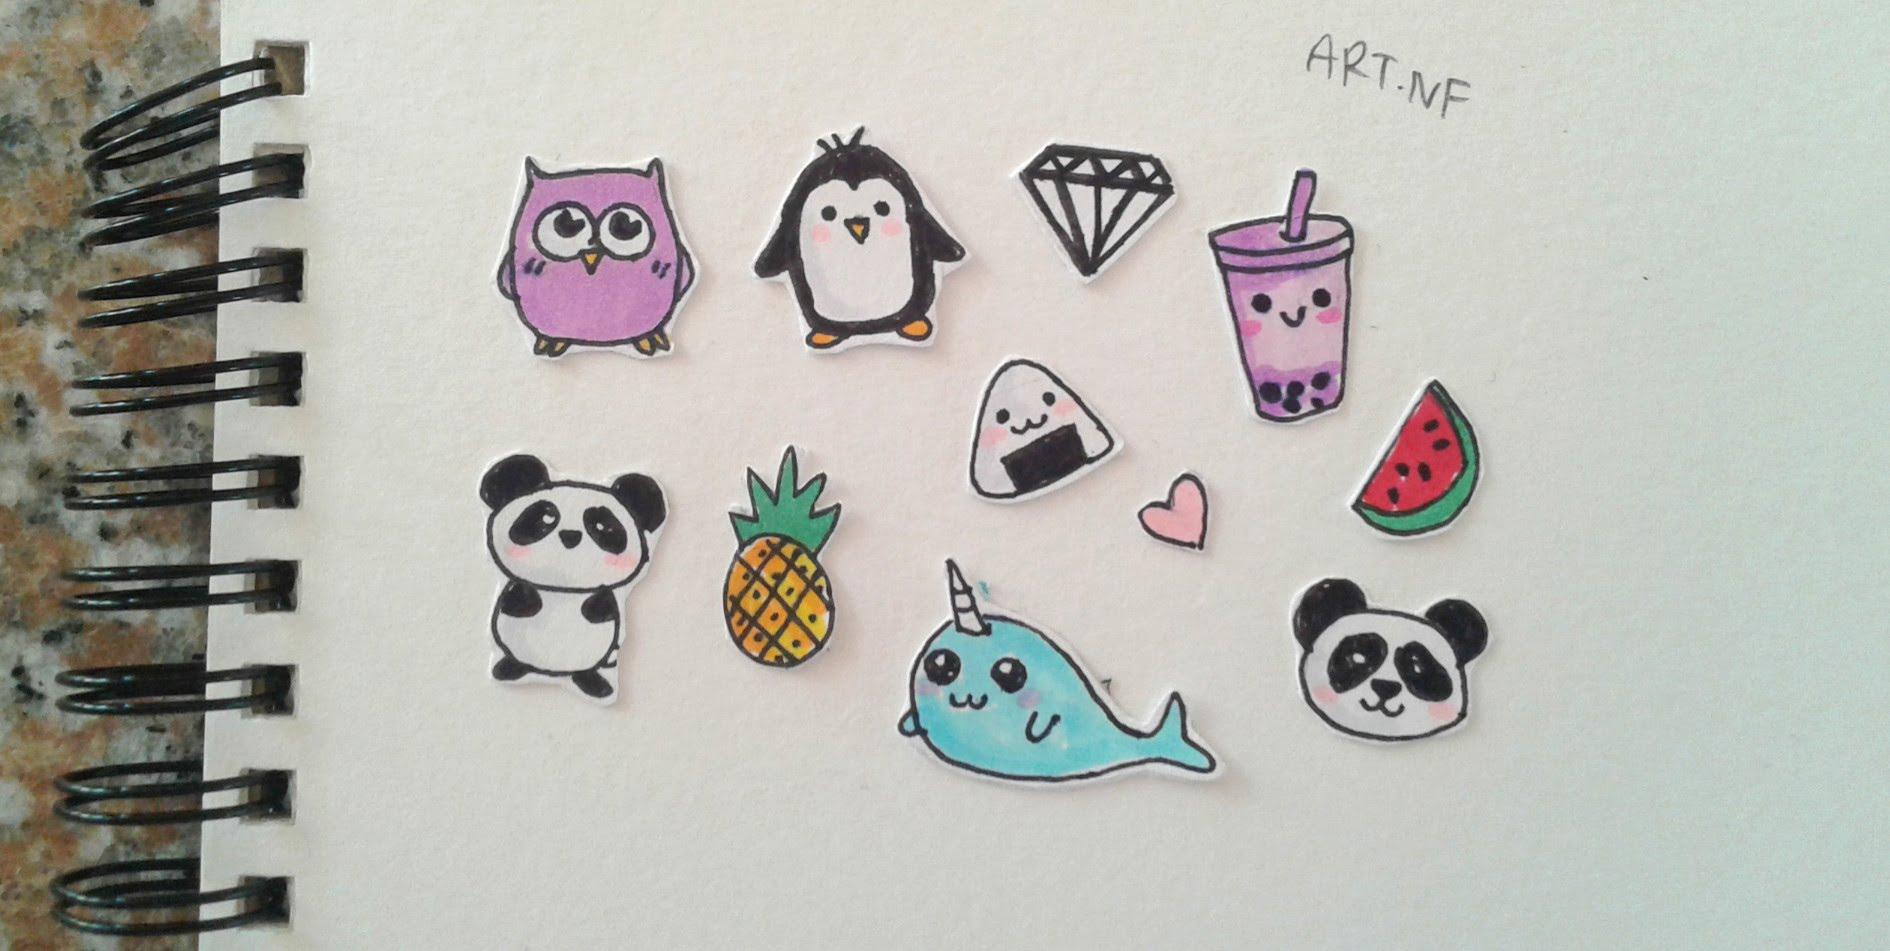 1890x951 Diy Tumblr Stickers (Drawings)